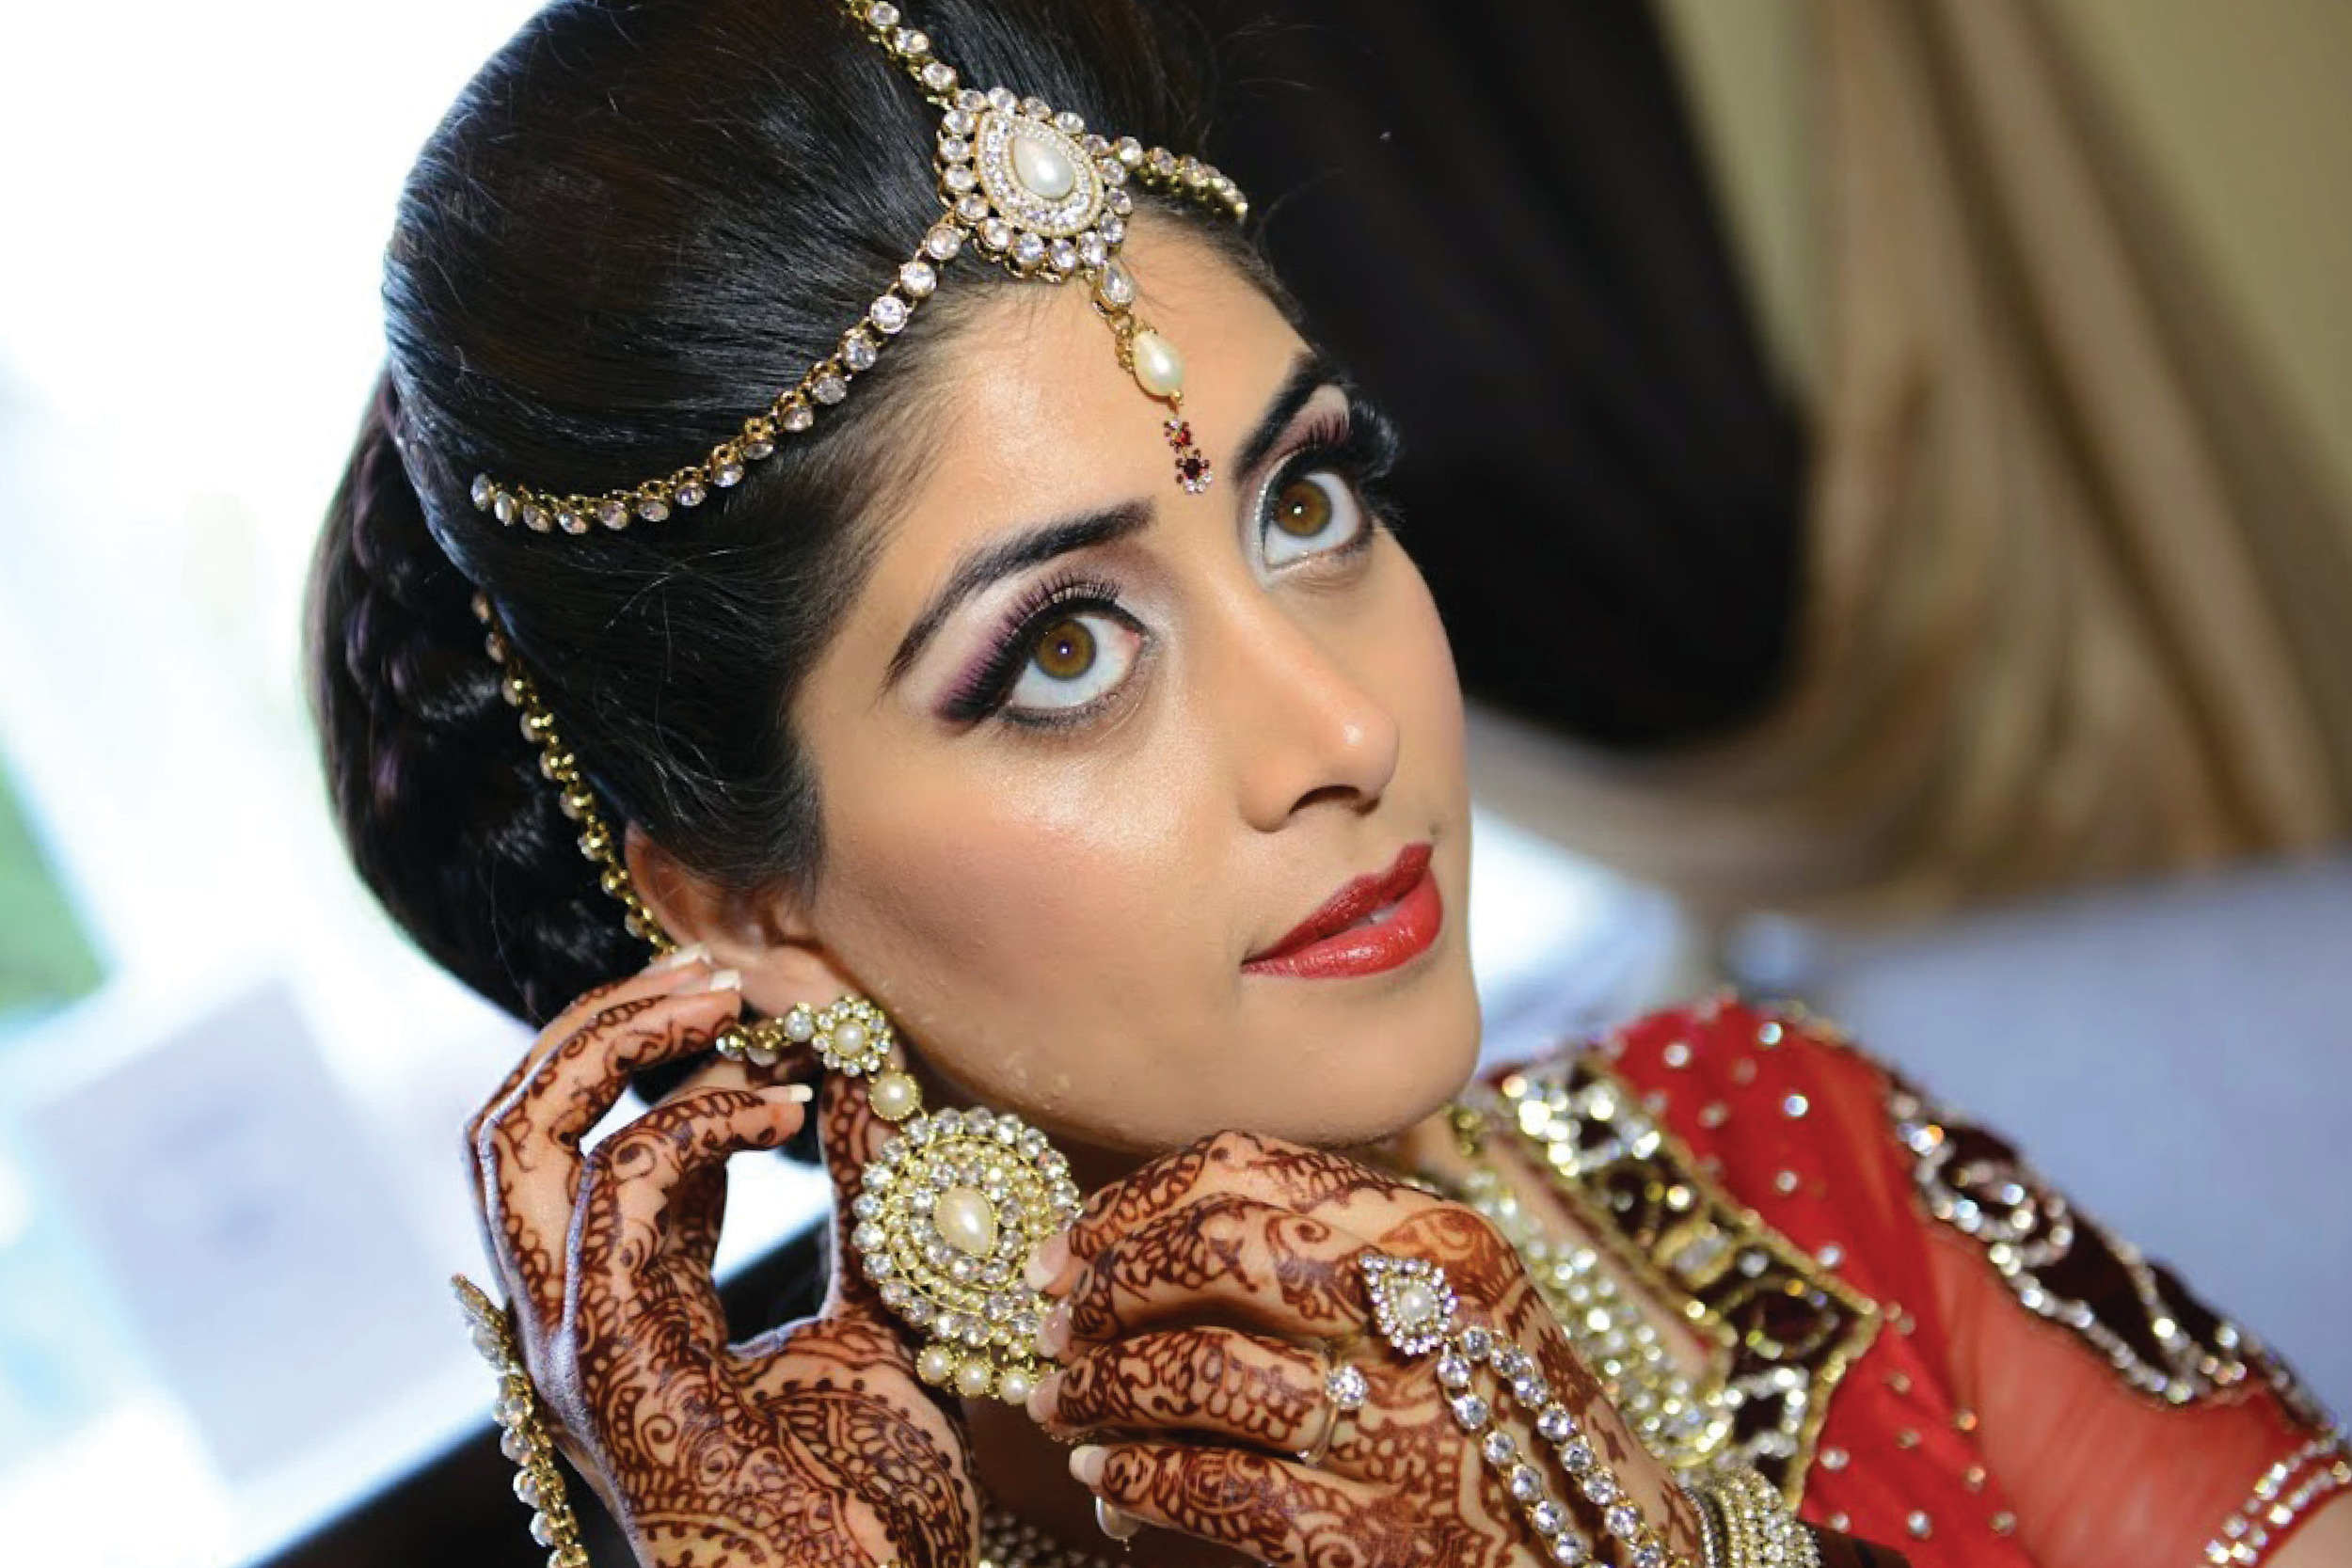 Bridal-makeup-image19.jpg